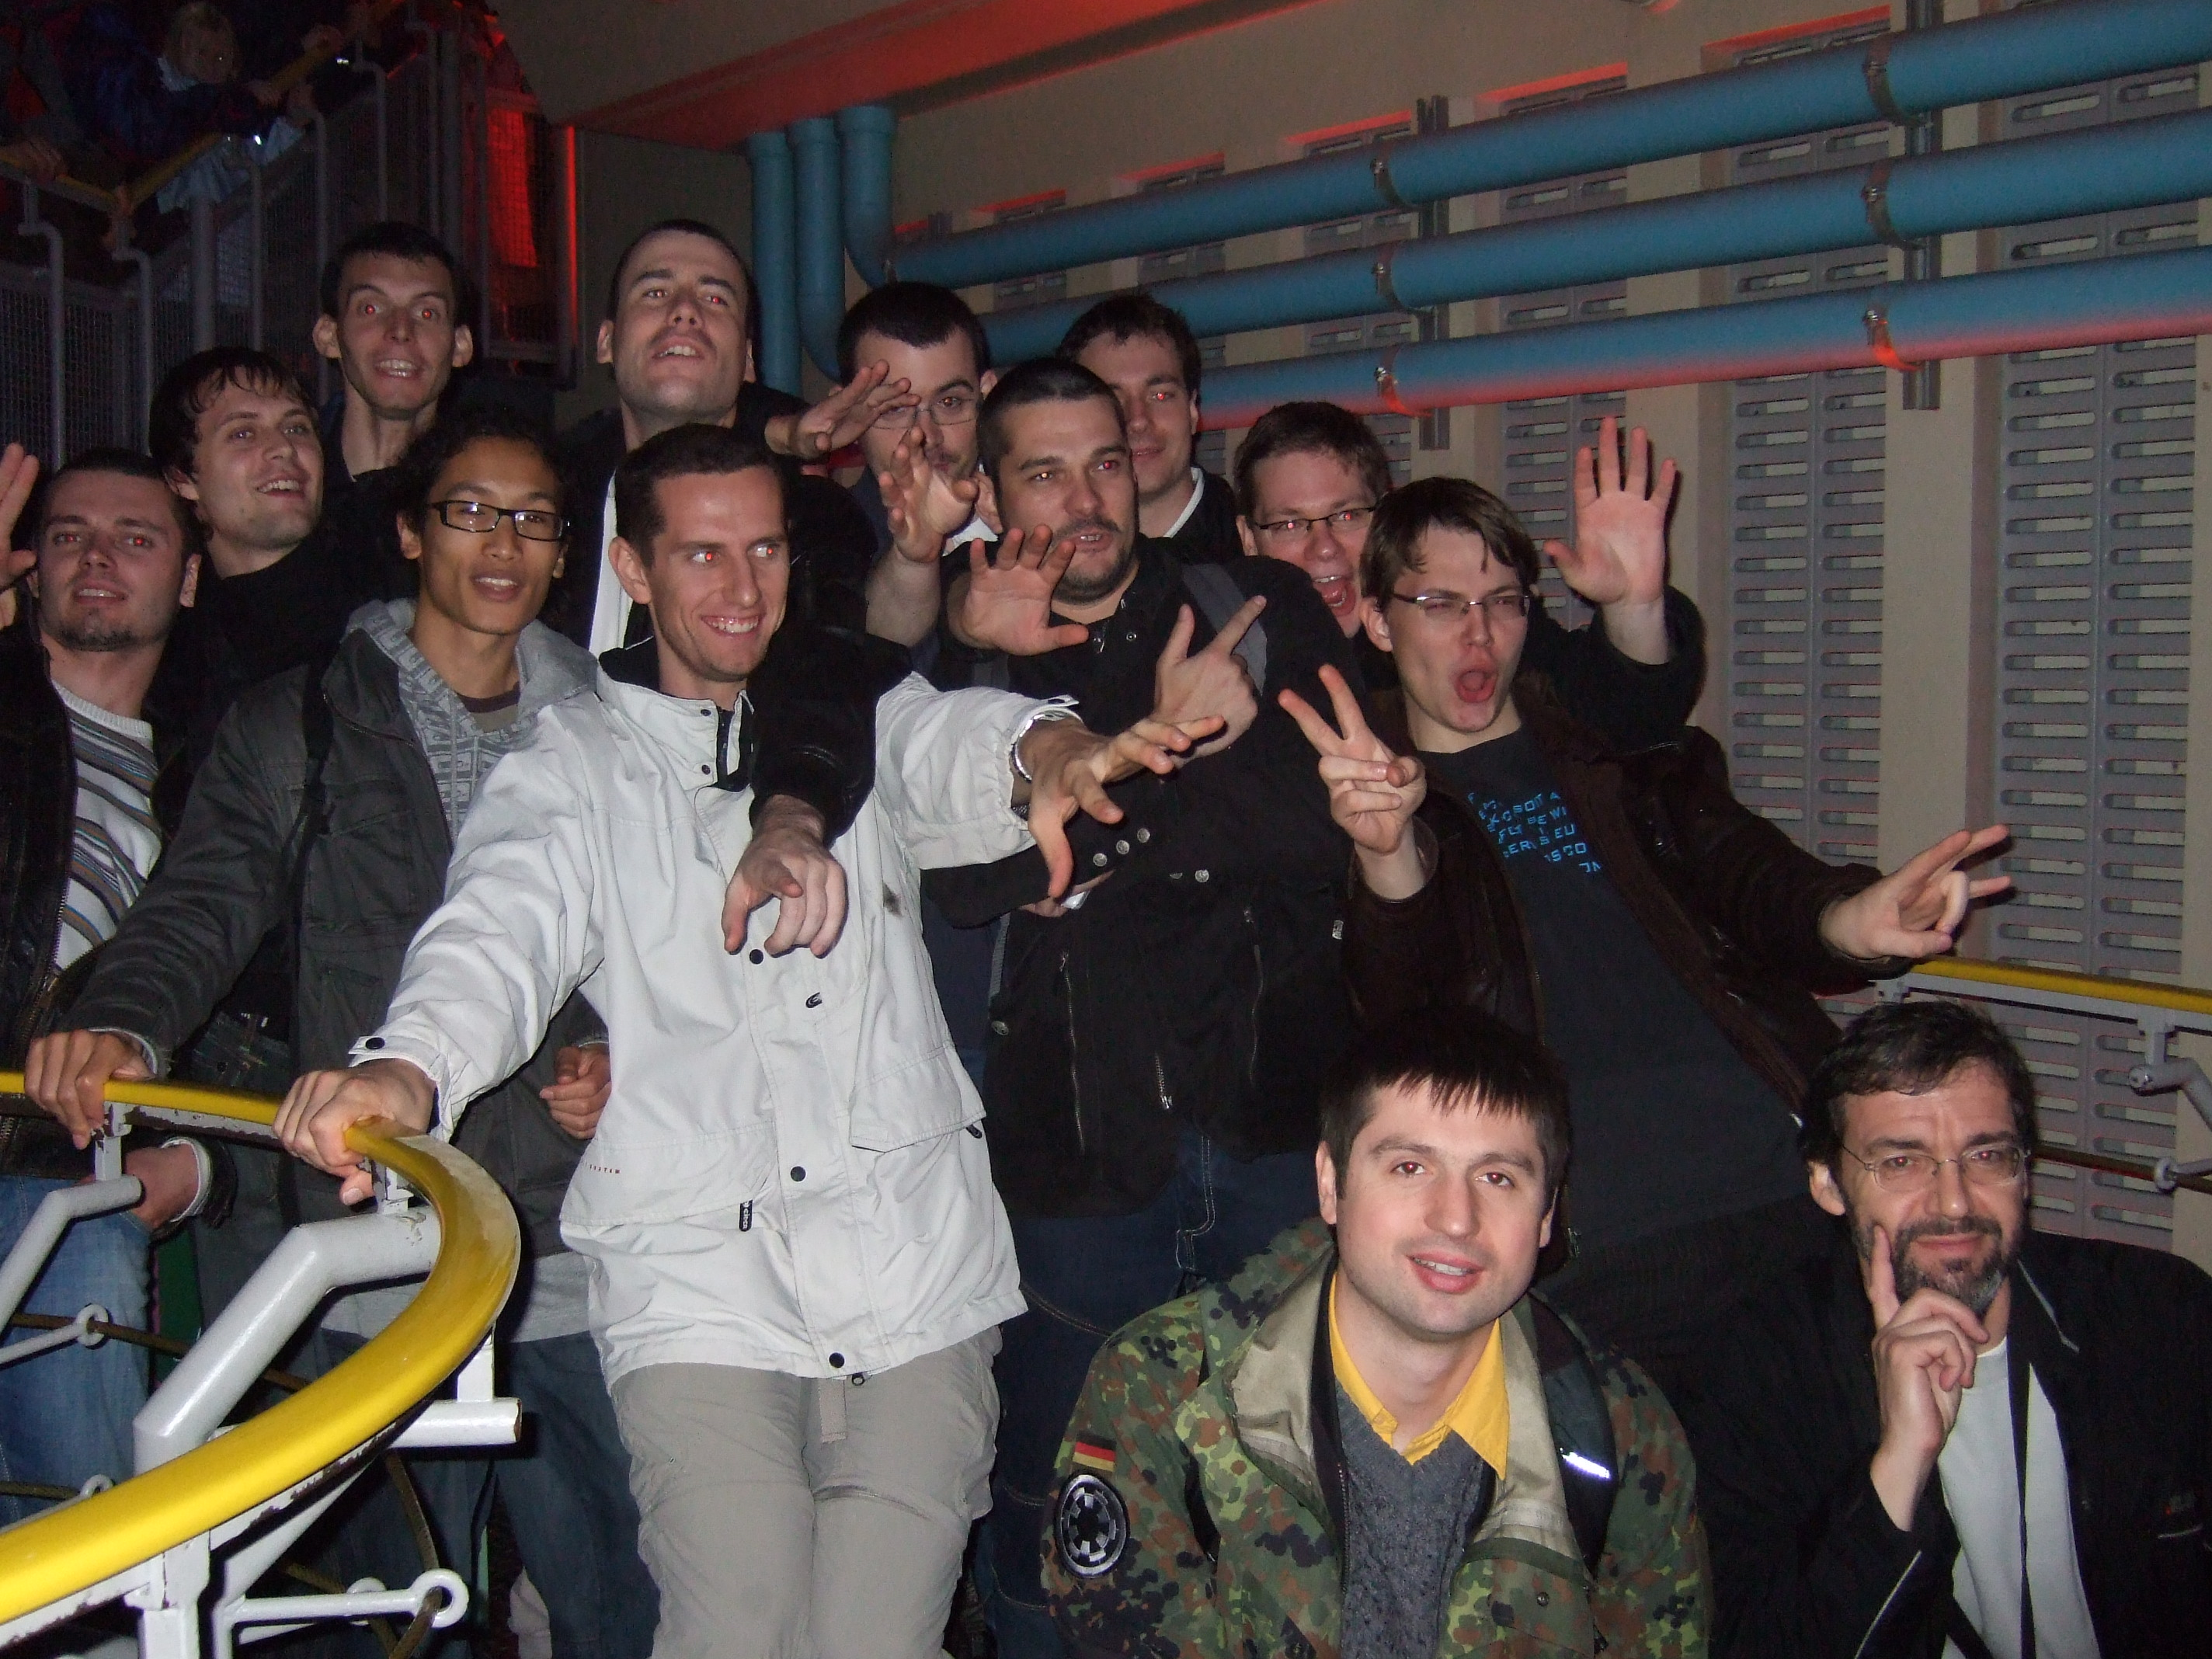 Photo 16 - Kardass, c3po75, will-jacen, obionescarabi, dref, Skarn, padawanthrawn, mouleu, Anakin07, Alpha8, Joruus29, boba.fett7, Jeff